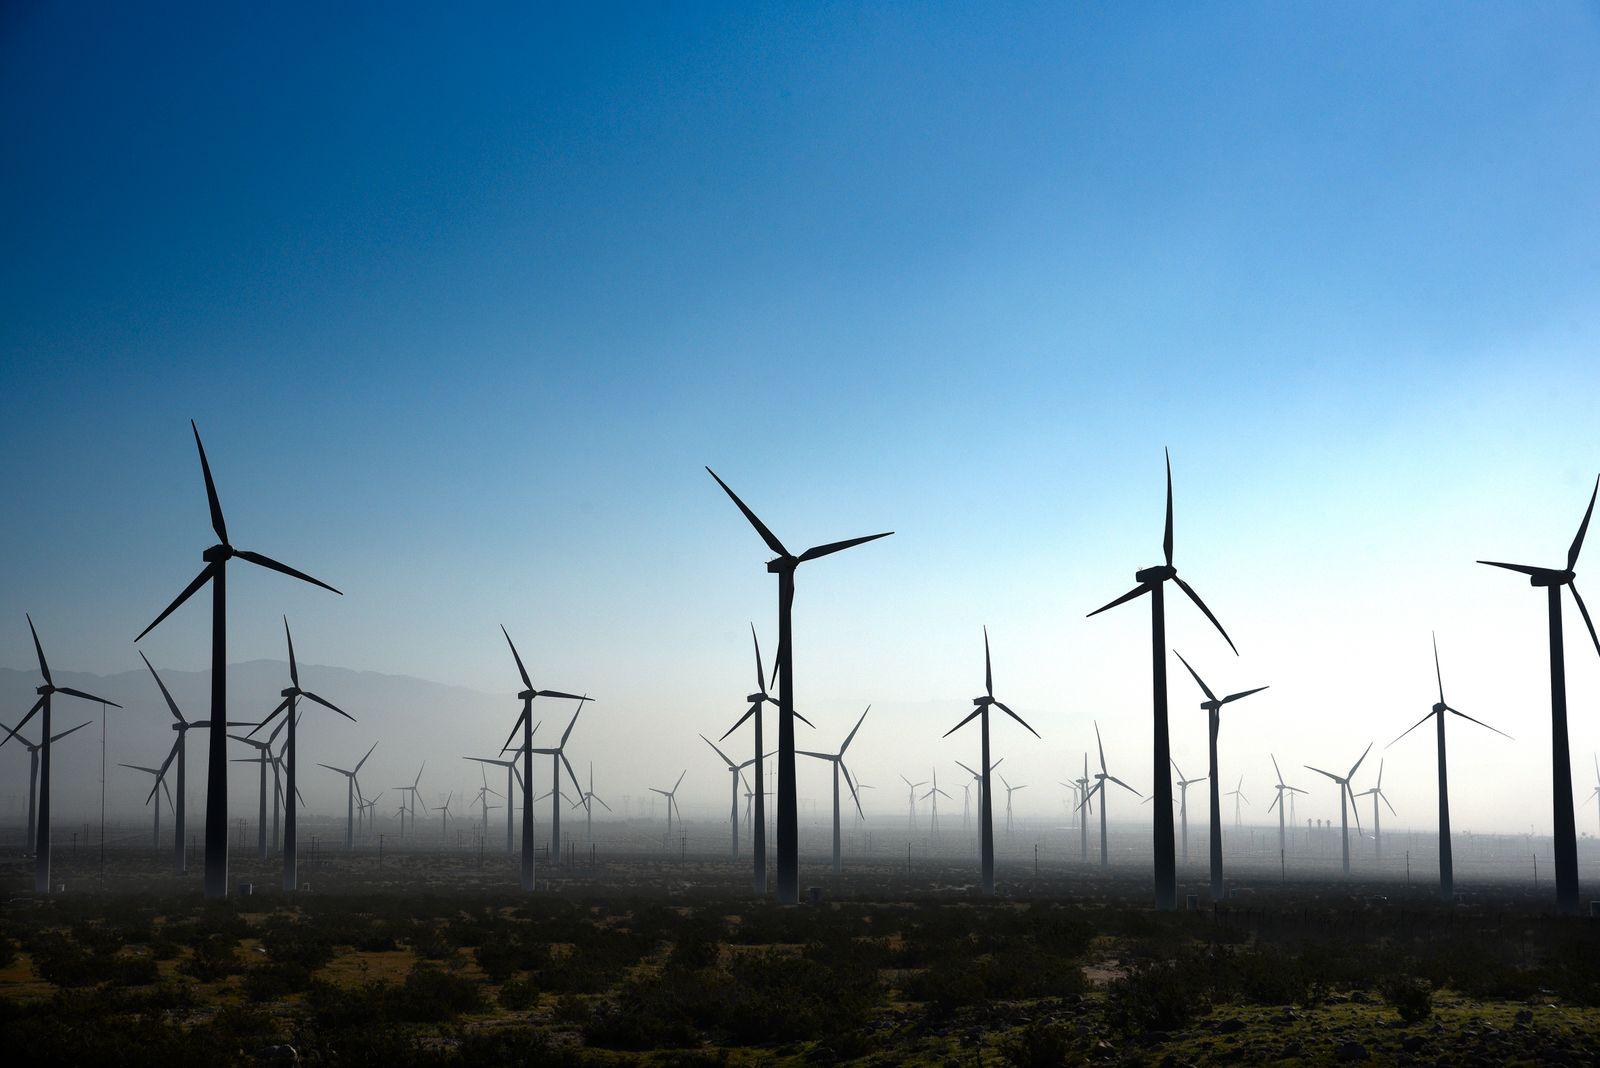 San Gorgonio Pass Wind Farm in Palm Springs, California